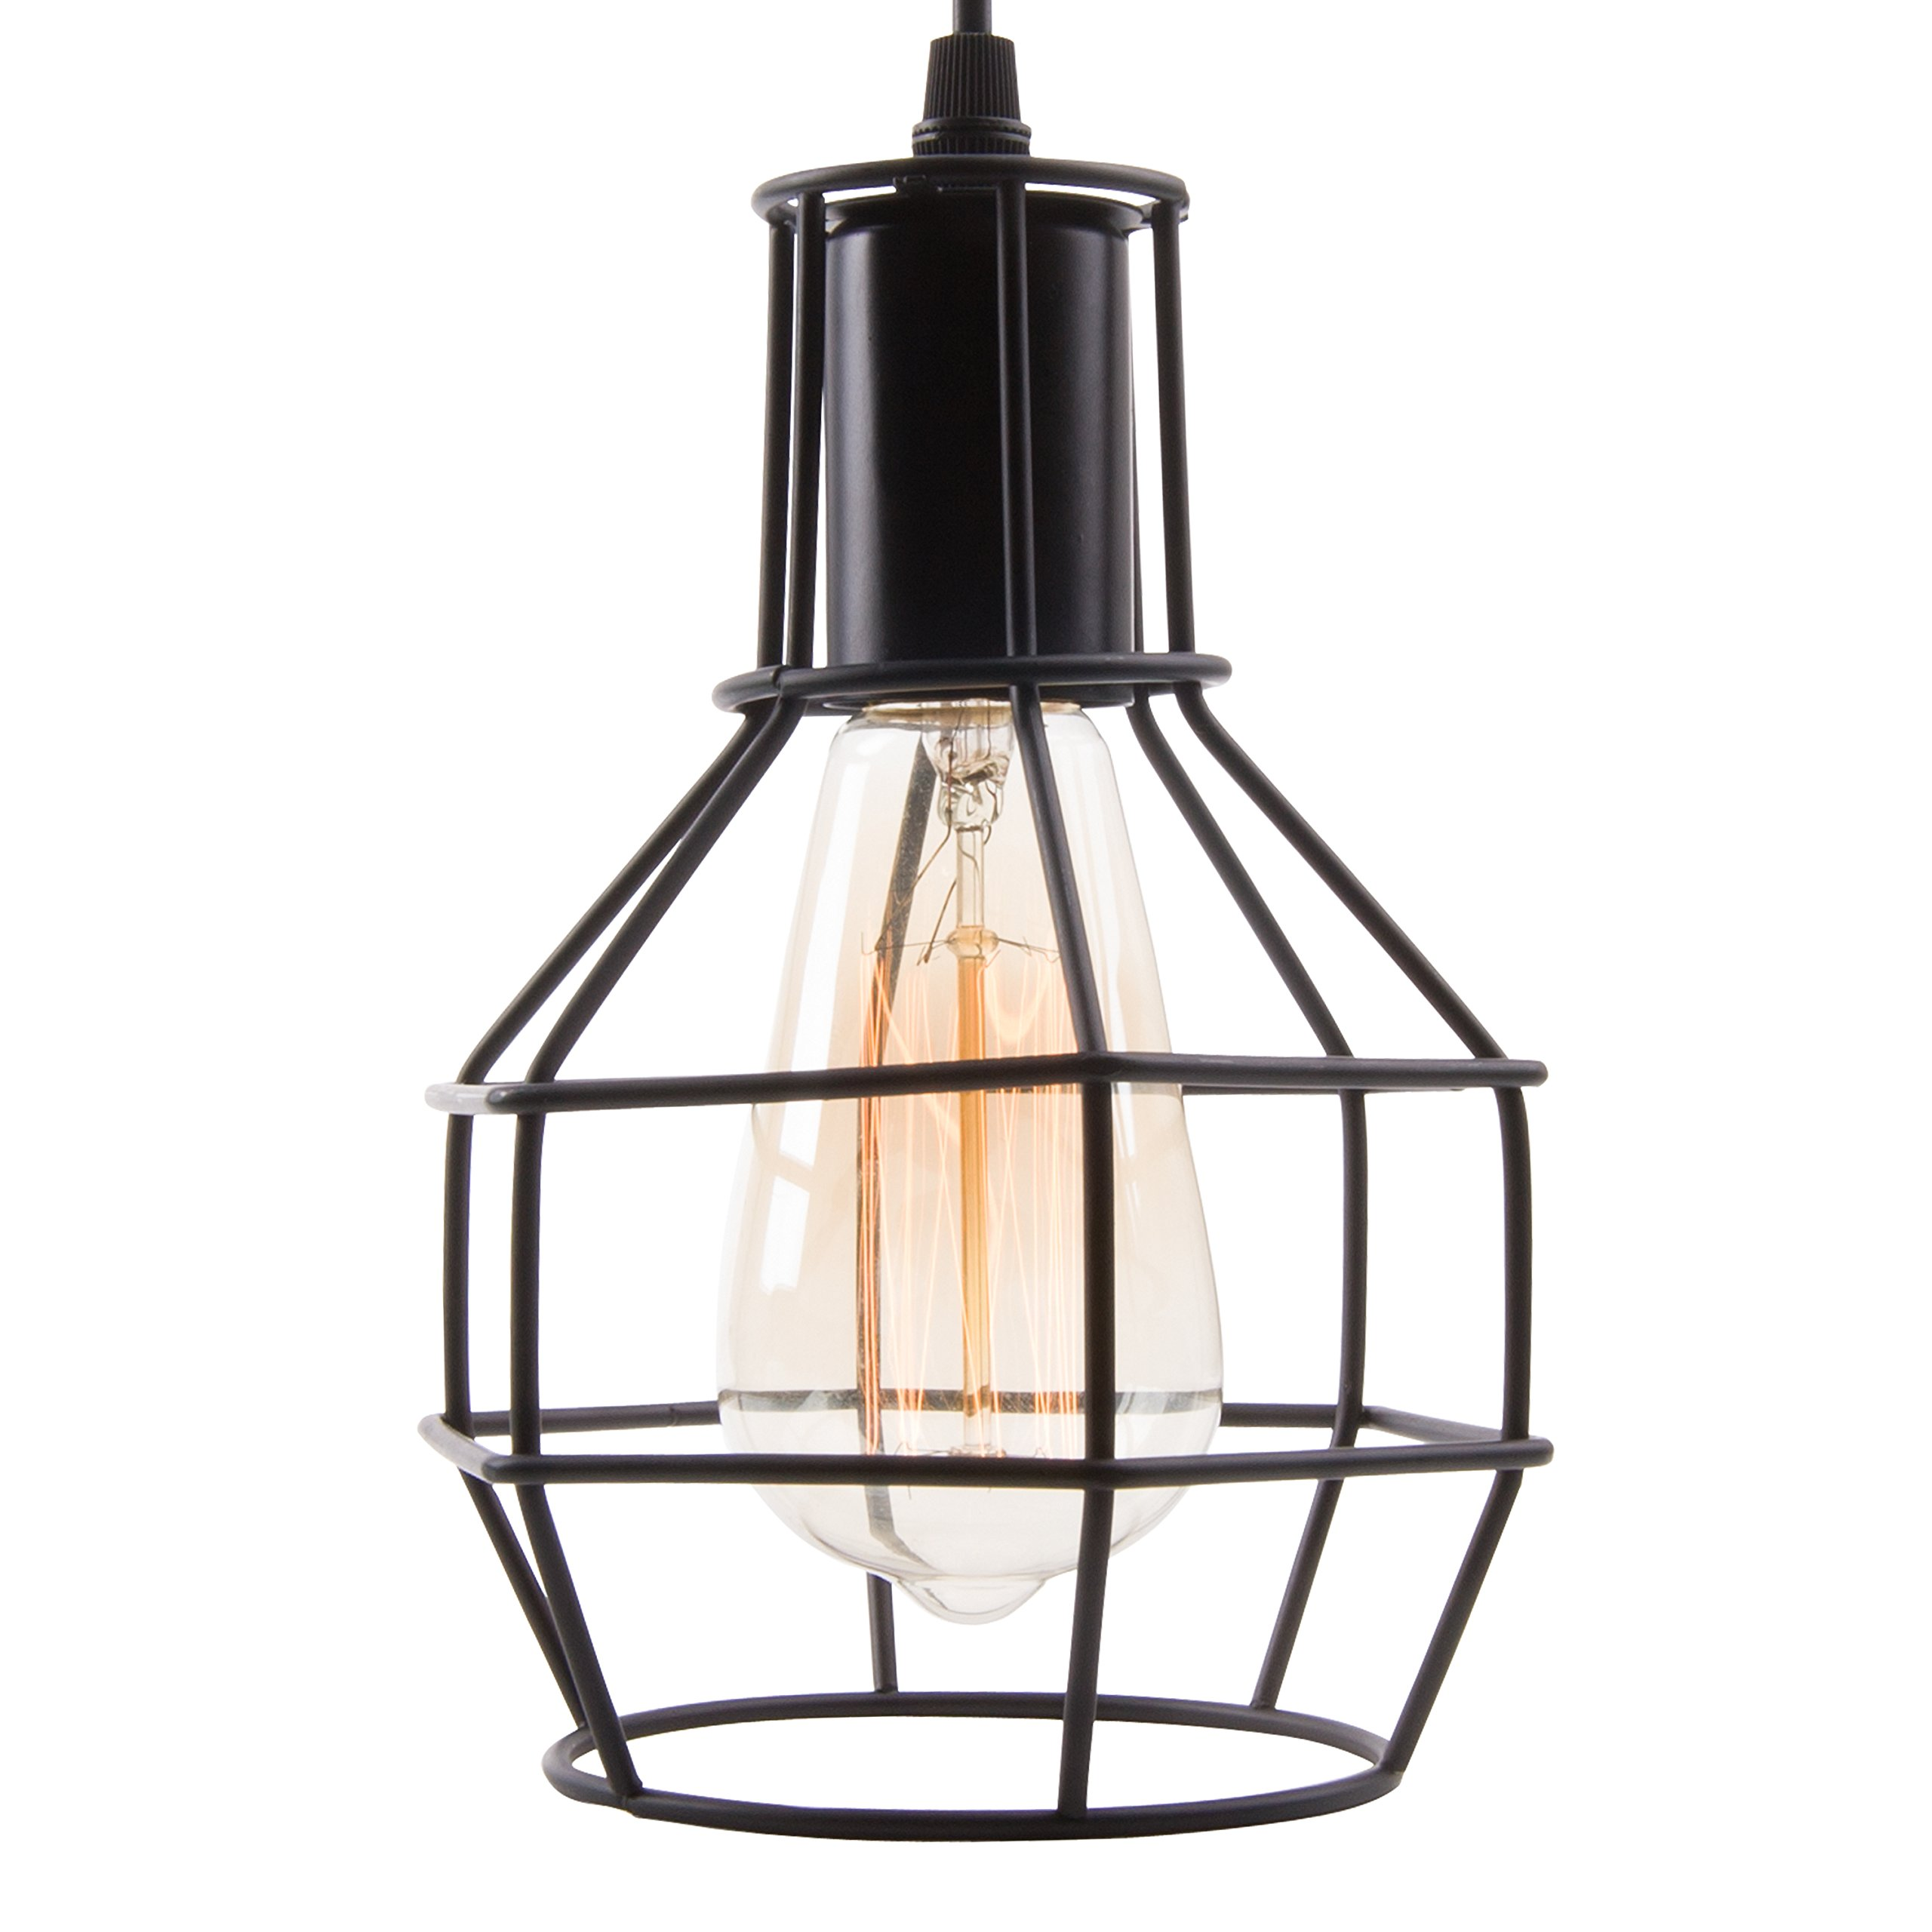 Veesee E26 Hanging Adjustable Industrial Lighting Fixtures,Vintage Ceiling Pendant Lamp Cage Holders,Edison Bulb Metal Chandelier Drop Light for Kitchen Island Restaurant Coffee(Black) by Veesee (Image #2)